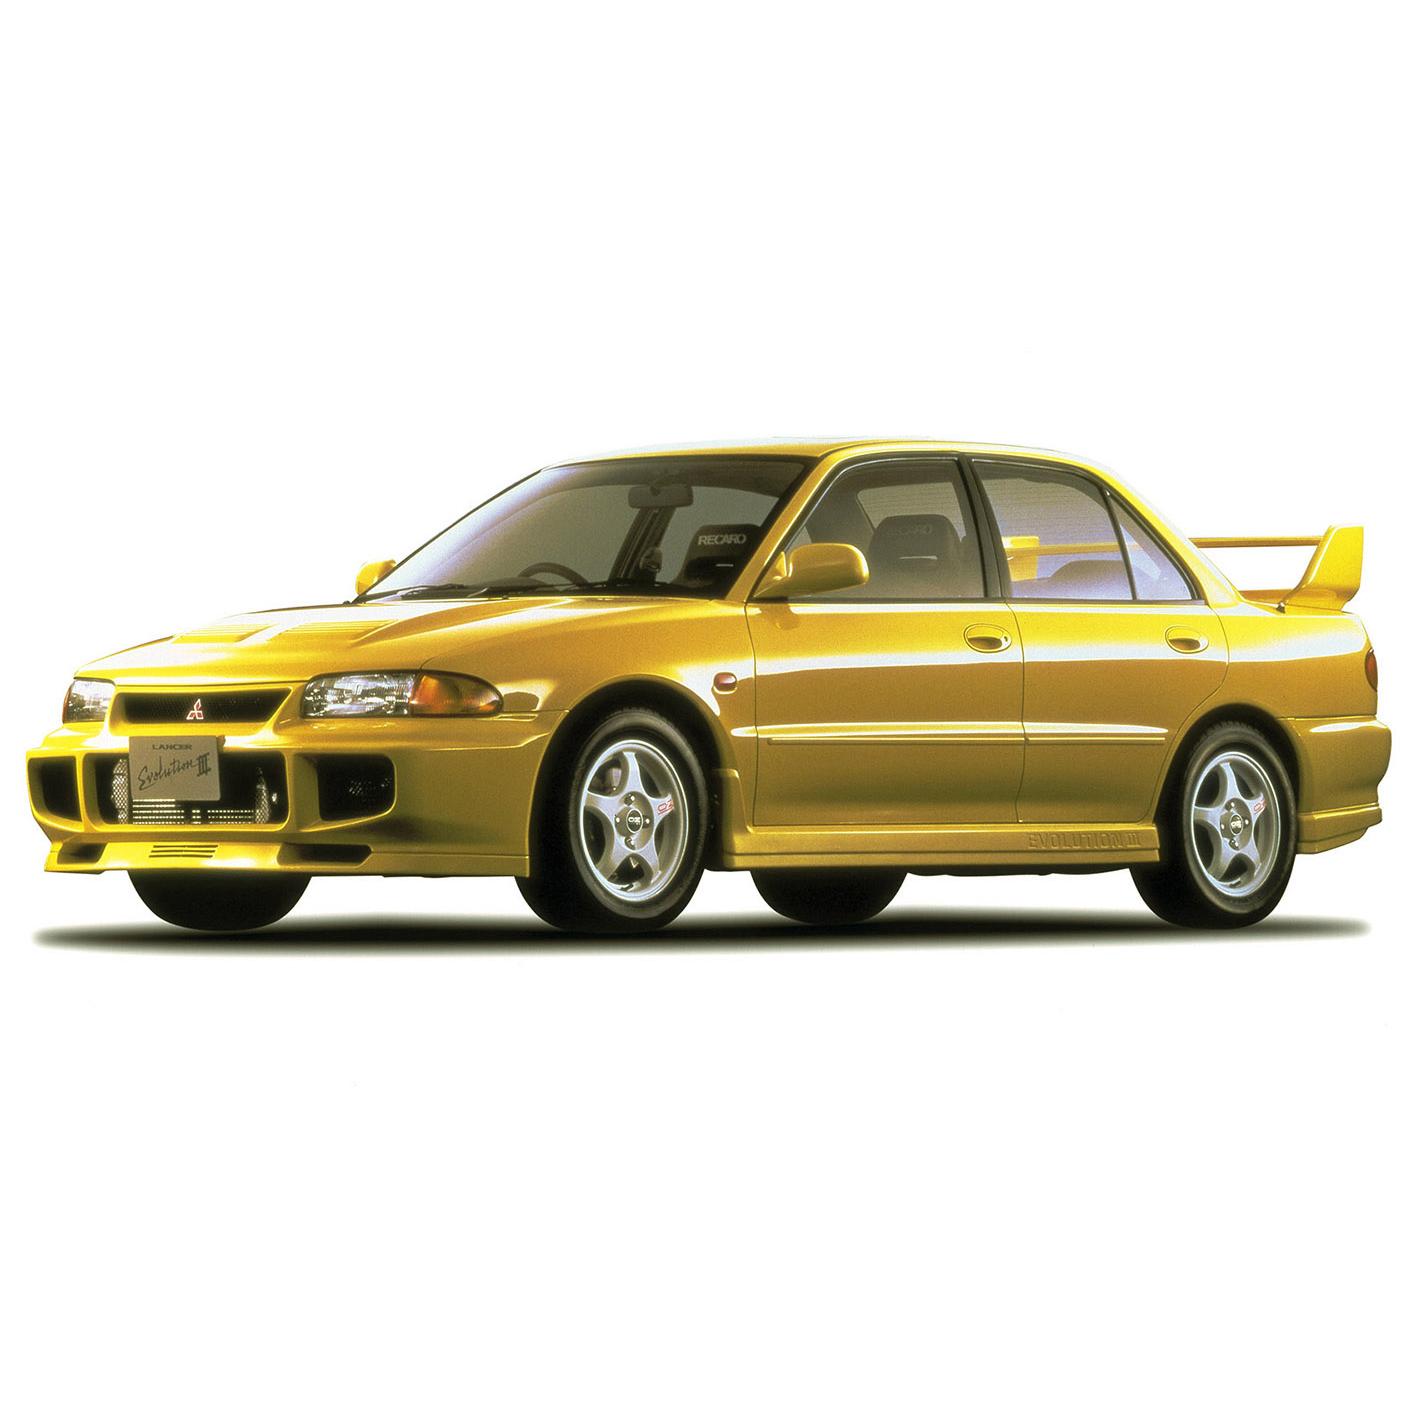 Mitsubishi Lancer Evolution 1&2&3 1992-1996